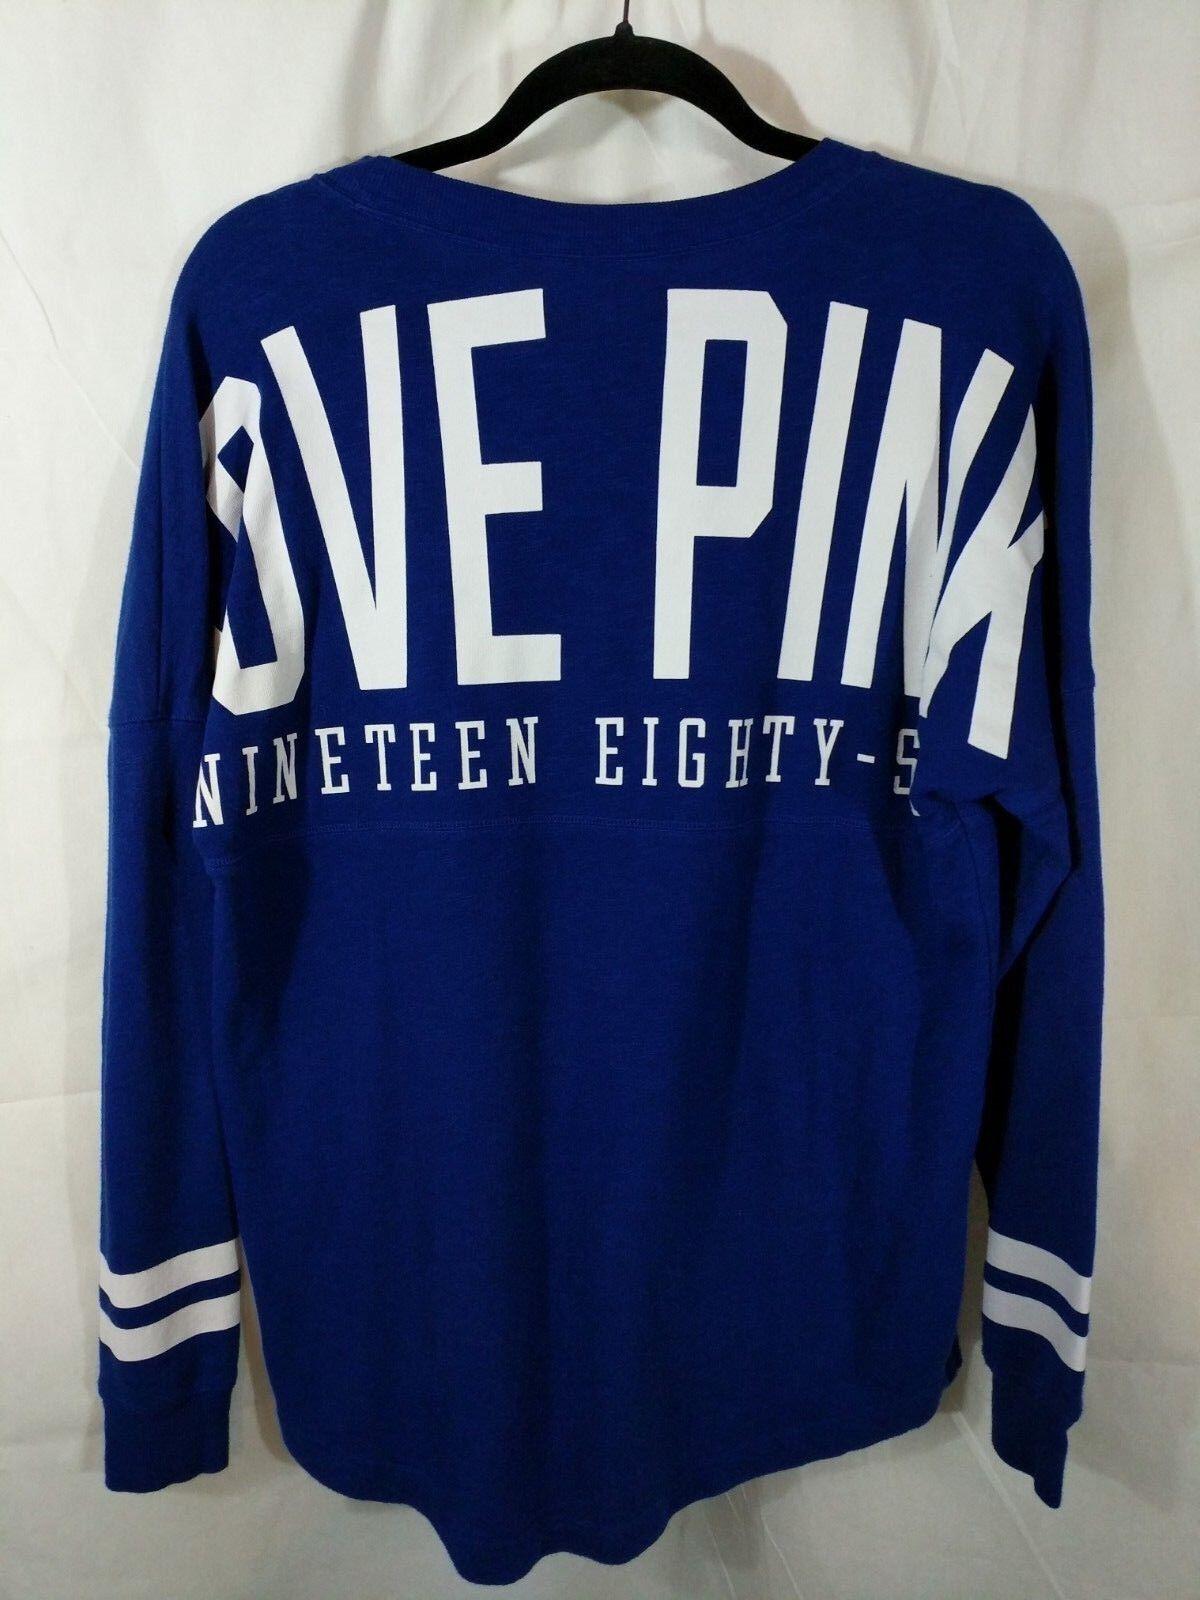 Victoria's Secret PINK bluee & White Varsity Crew Sweatshirt Small NWOT